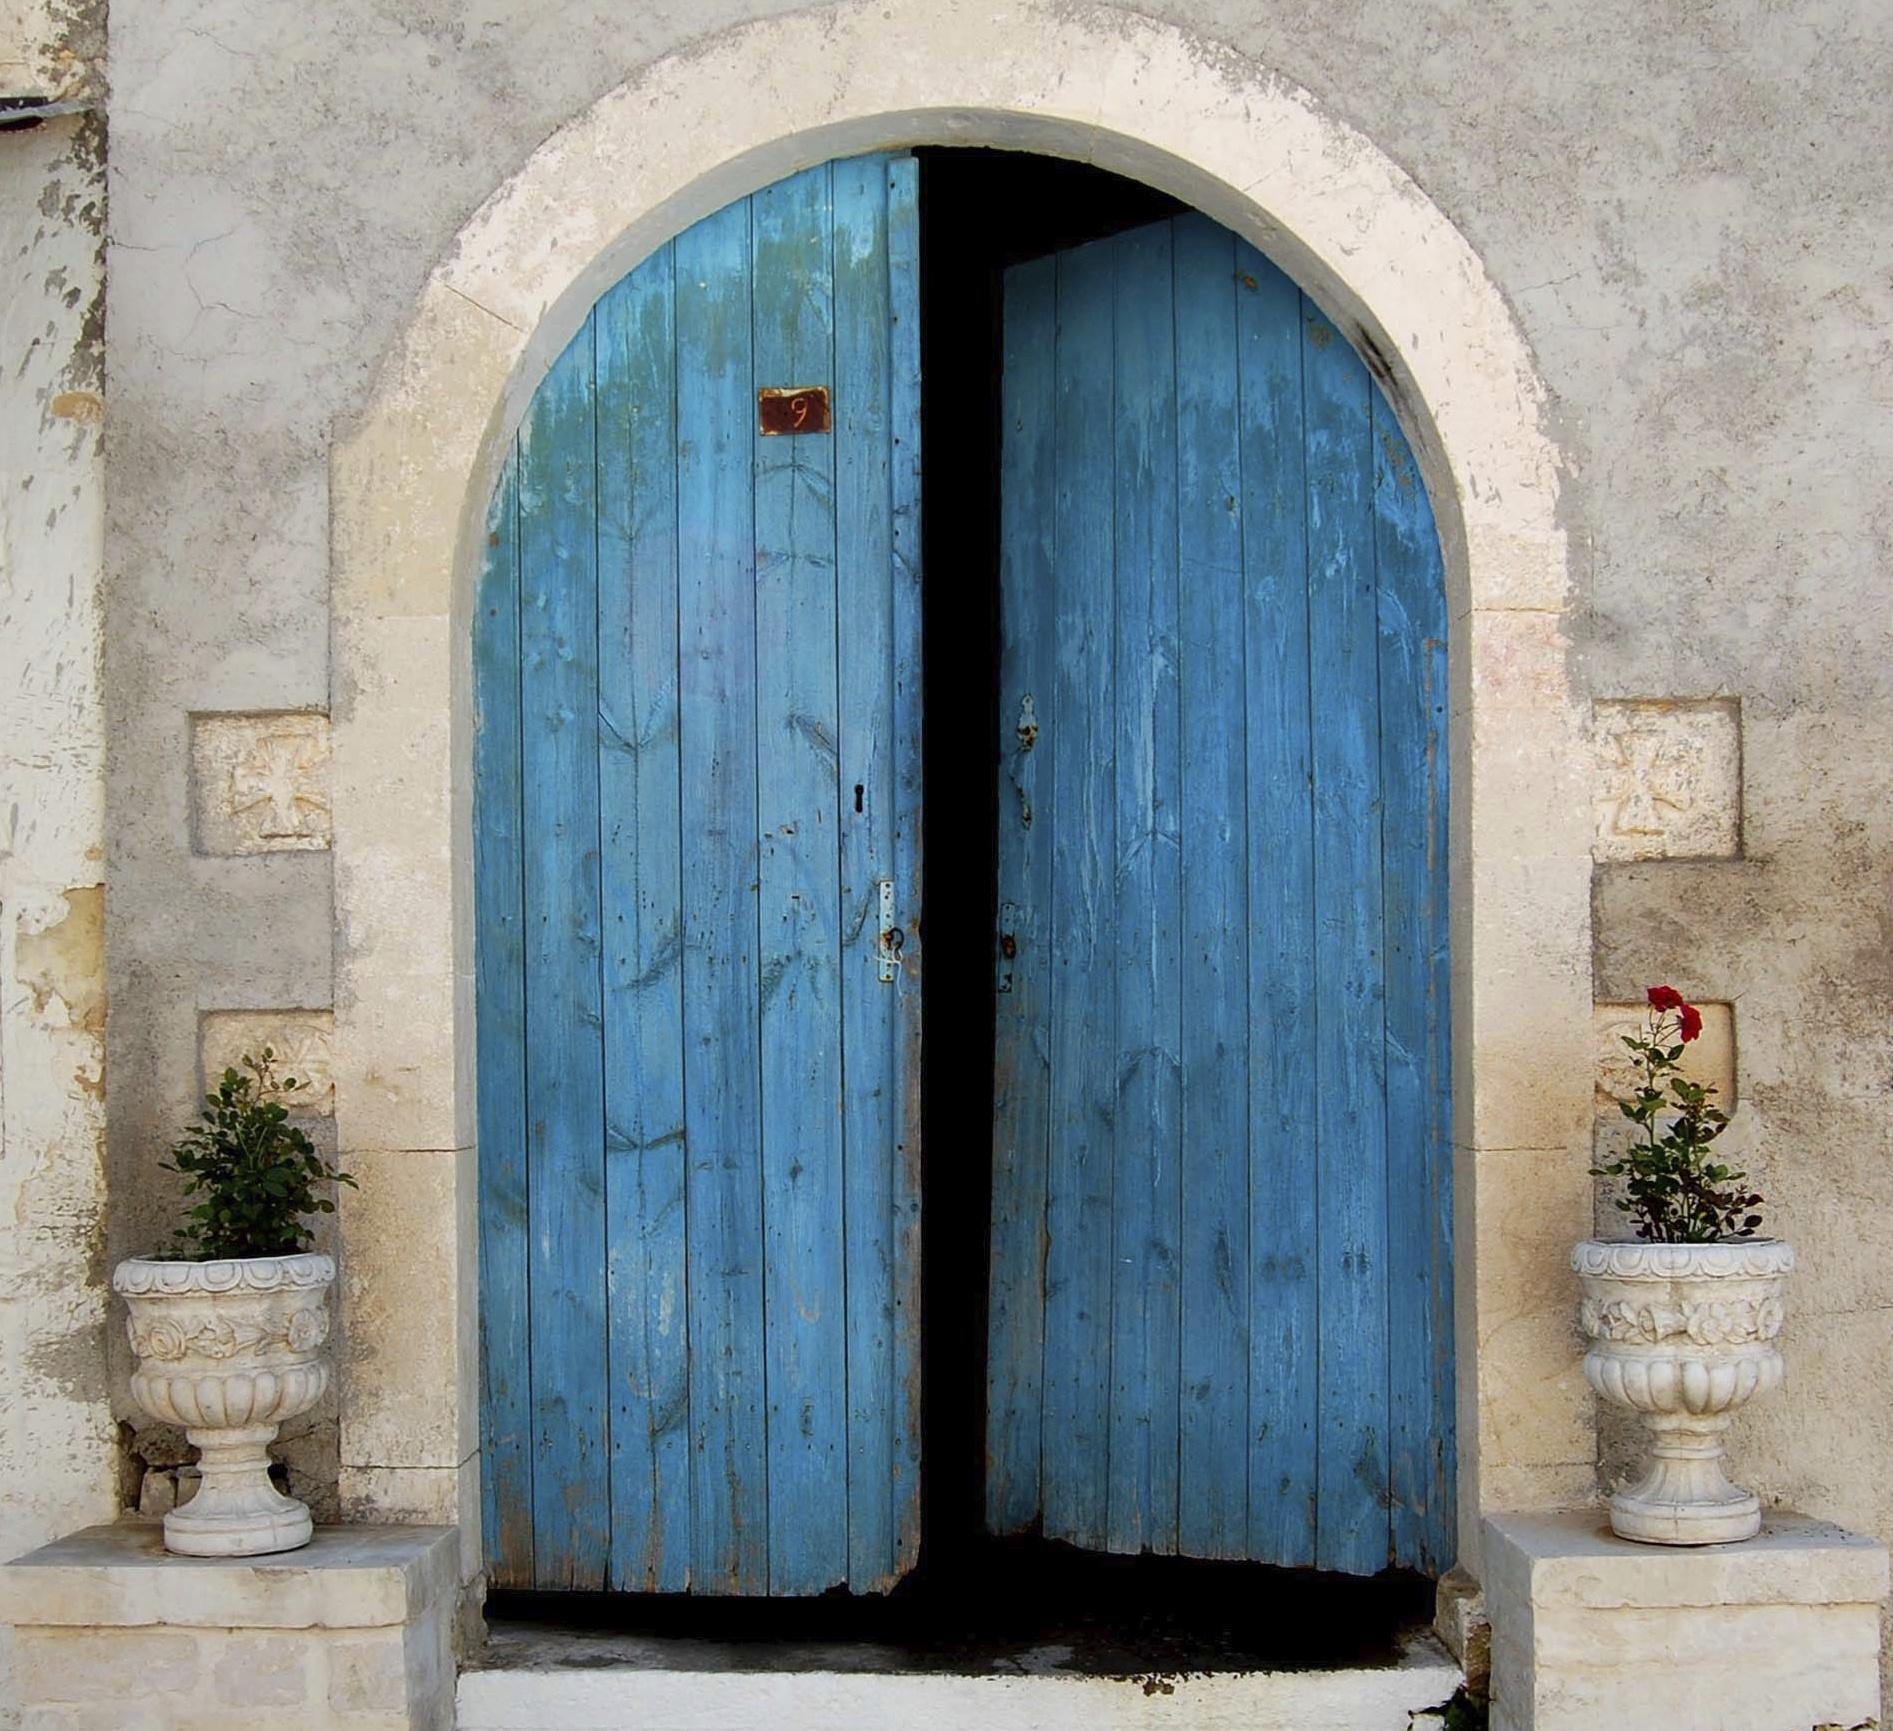 Doorkeepers of Illusion or The Open Door to Joy & Doorkeepers of Illusion or The Open Door to Joy u2014 B Prior pezcame.com